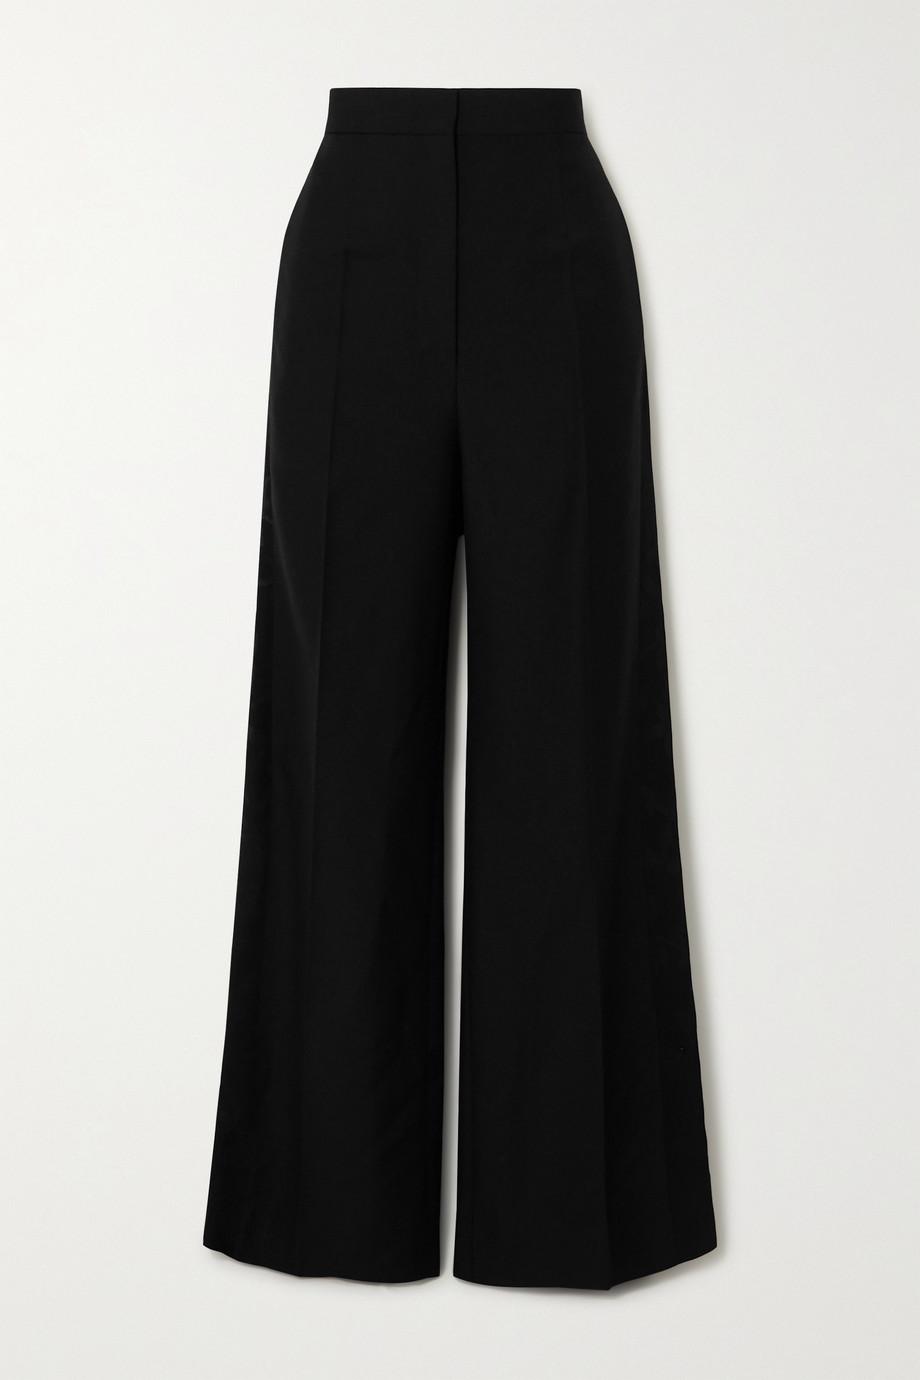 Loewe Satin jacquard-trimmed wool wide-leg pants